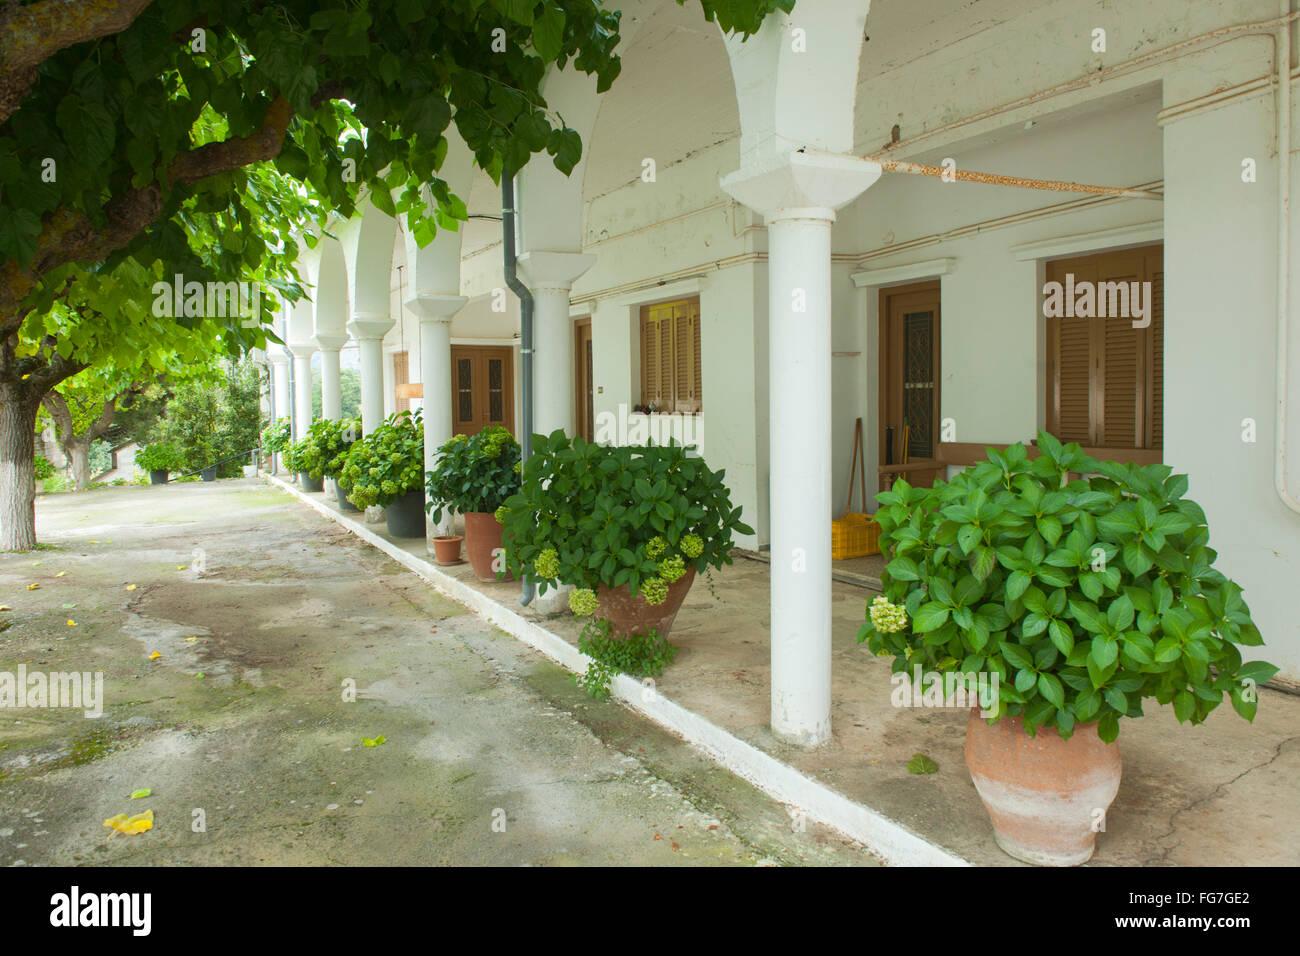 Griechenland, Kreta, Lassithi-Hochebene, Agios Konstantinos, Kloster Kroustallenia - Stock Image